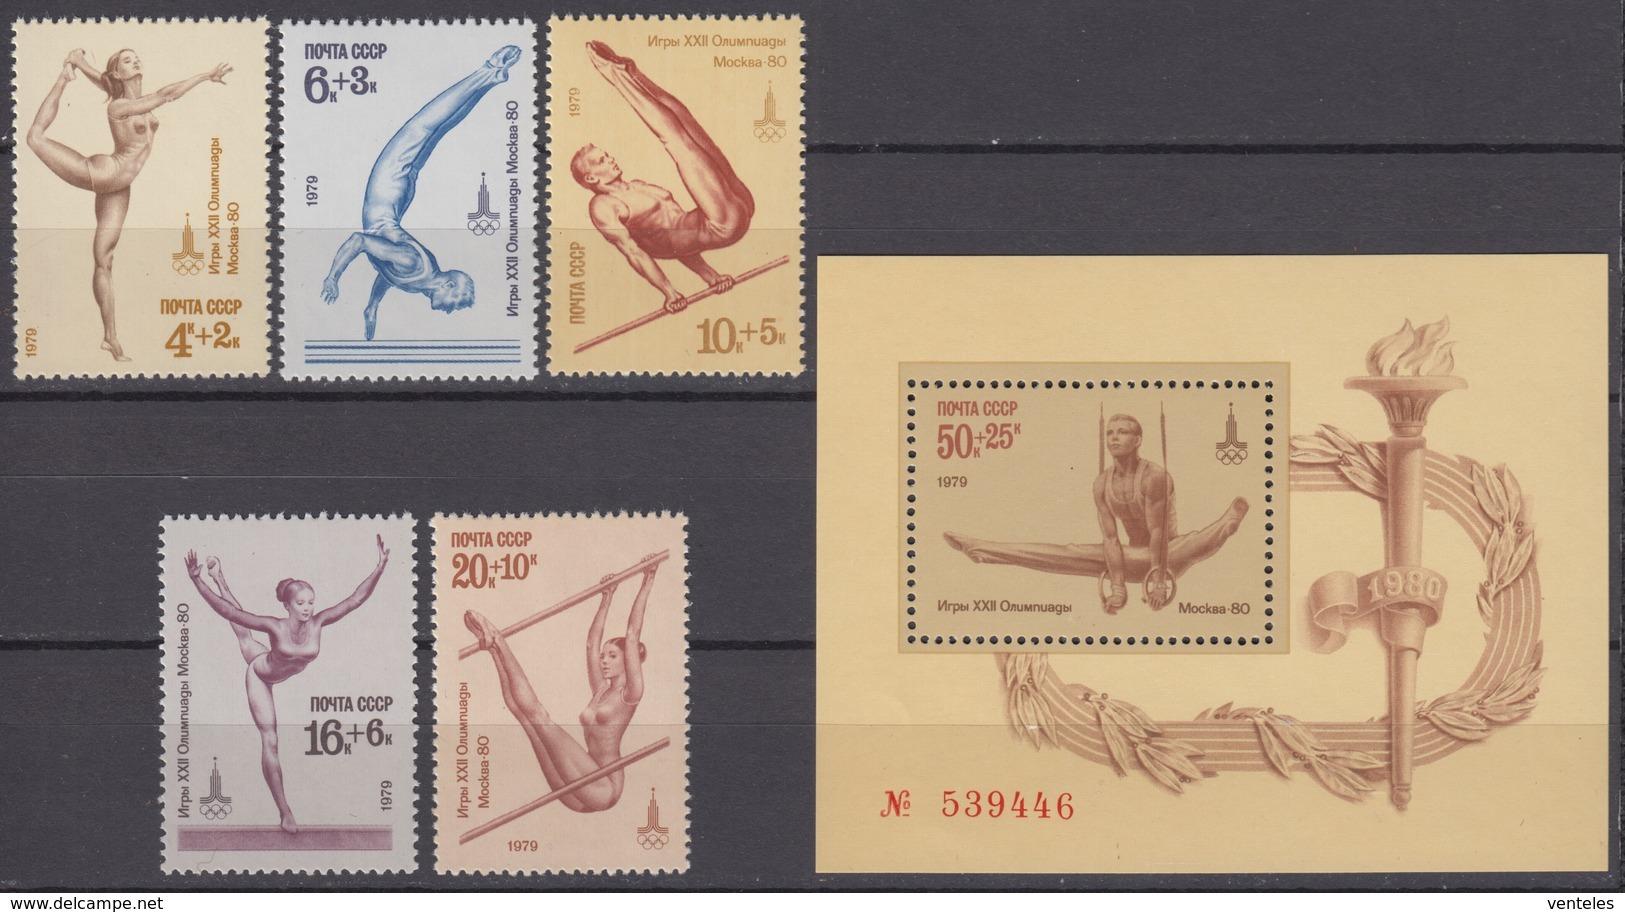 Russia, USSR 21.03.1979Mi # 4830-34 Bl 136; Moscow Summer Olympics (IX) MNH OG - Nuevos